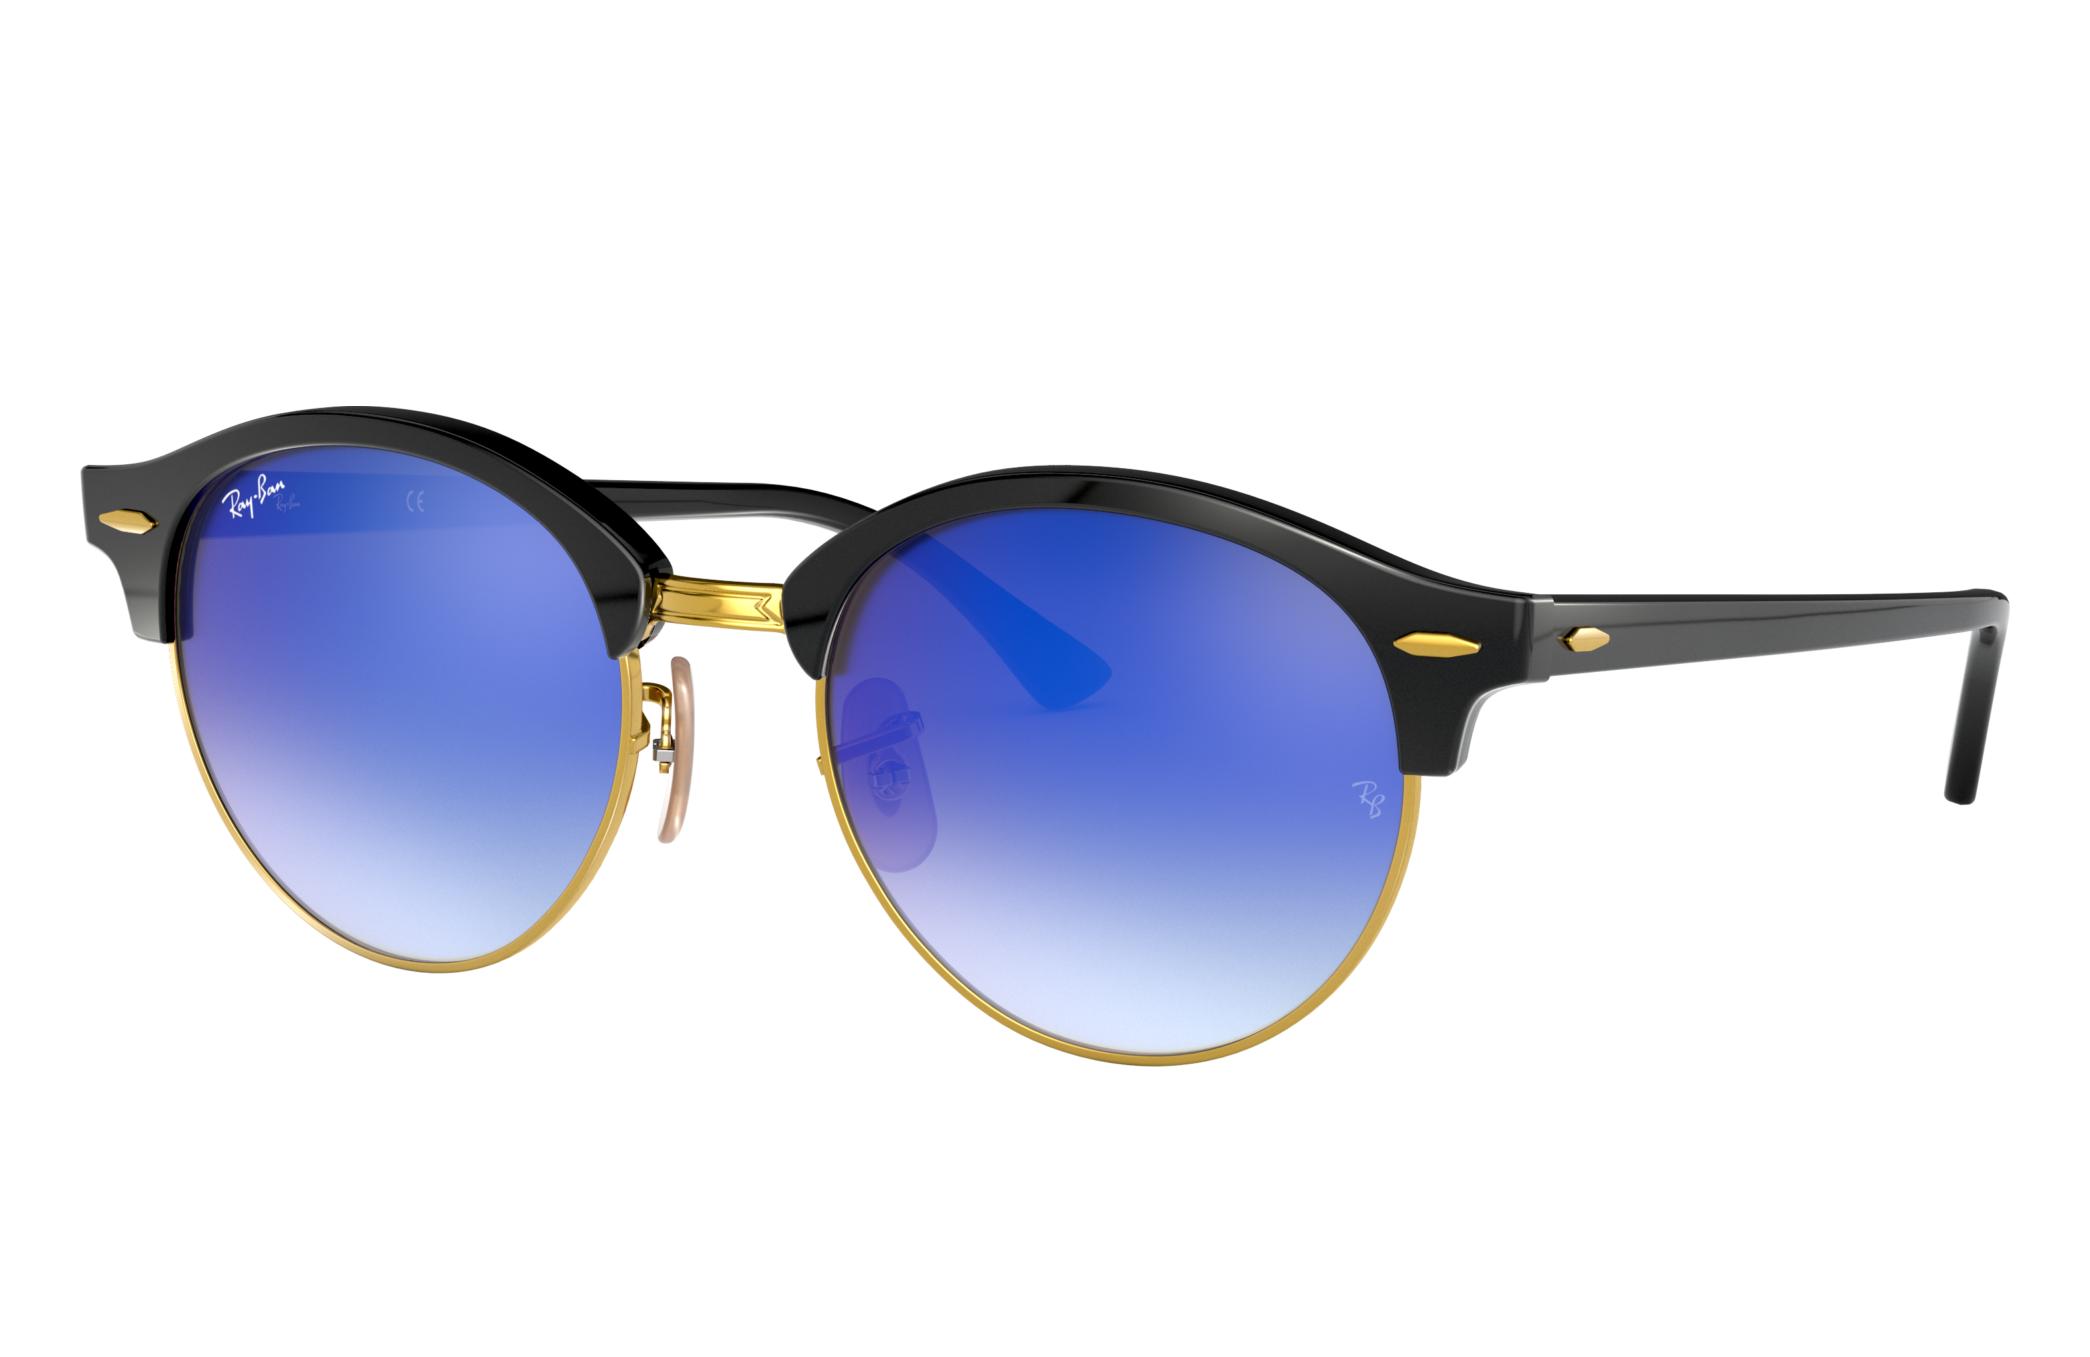 Ray-Ban Clubround Flash Lenses Black, Blue Lenses - RB4246